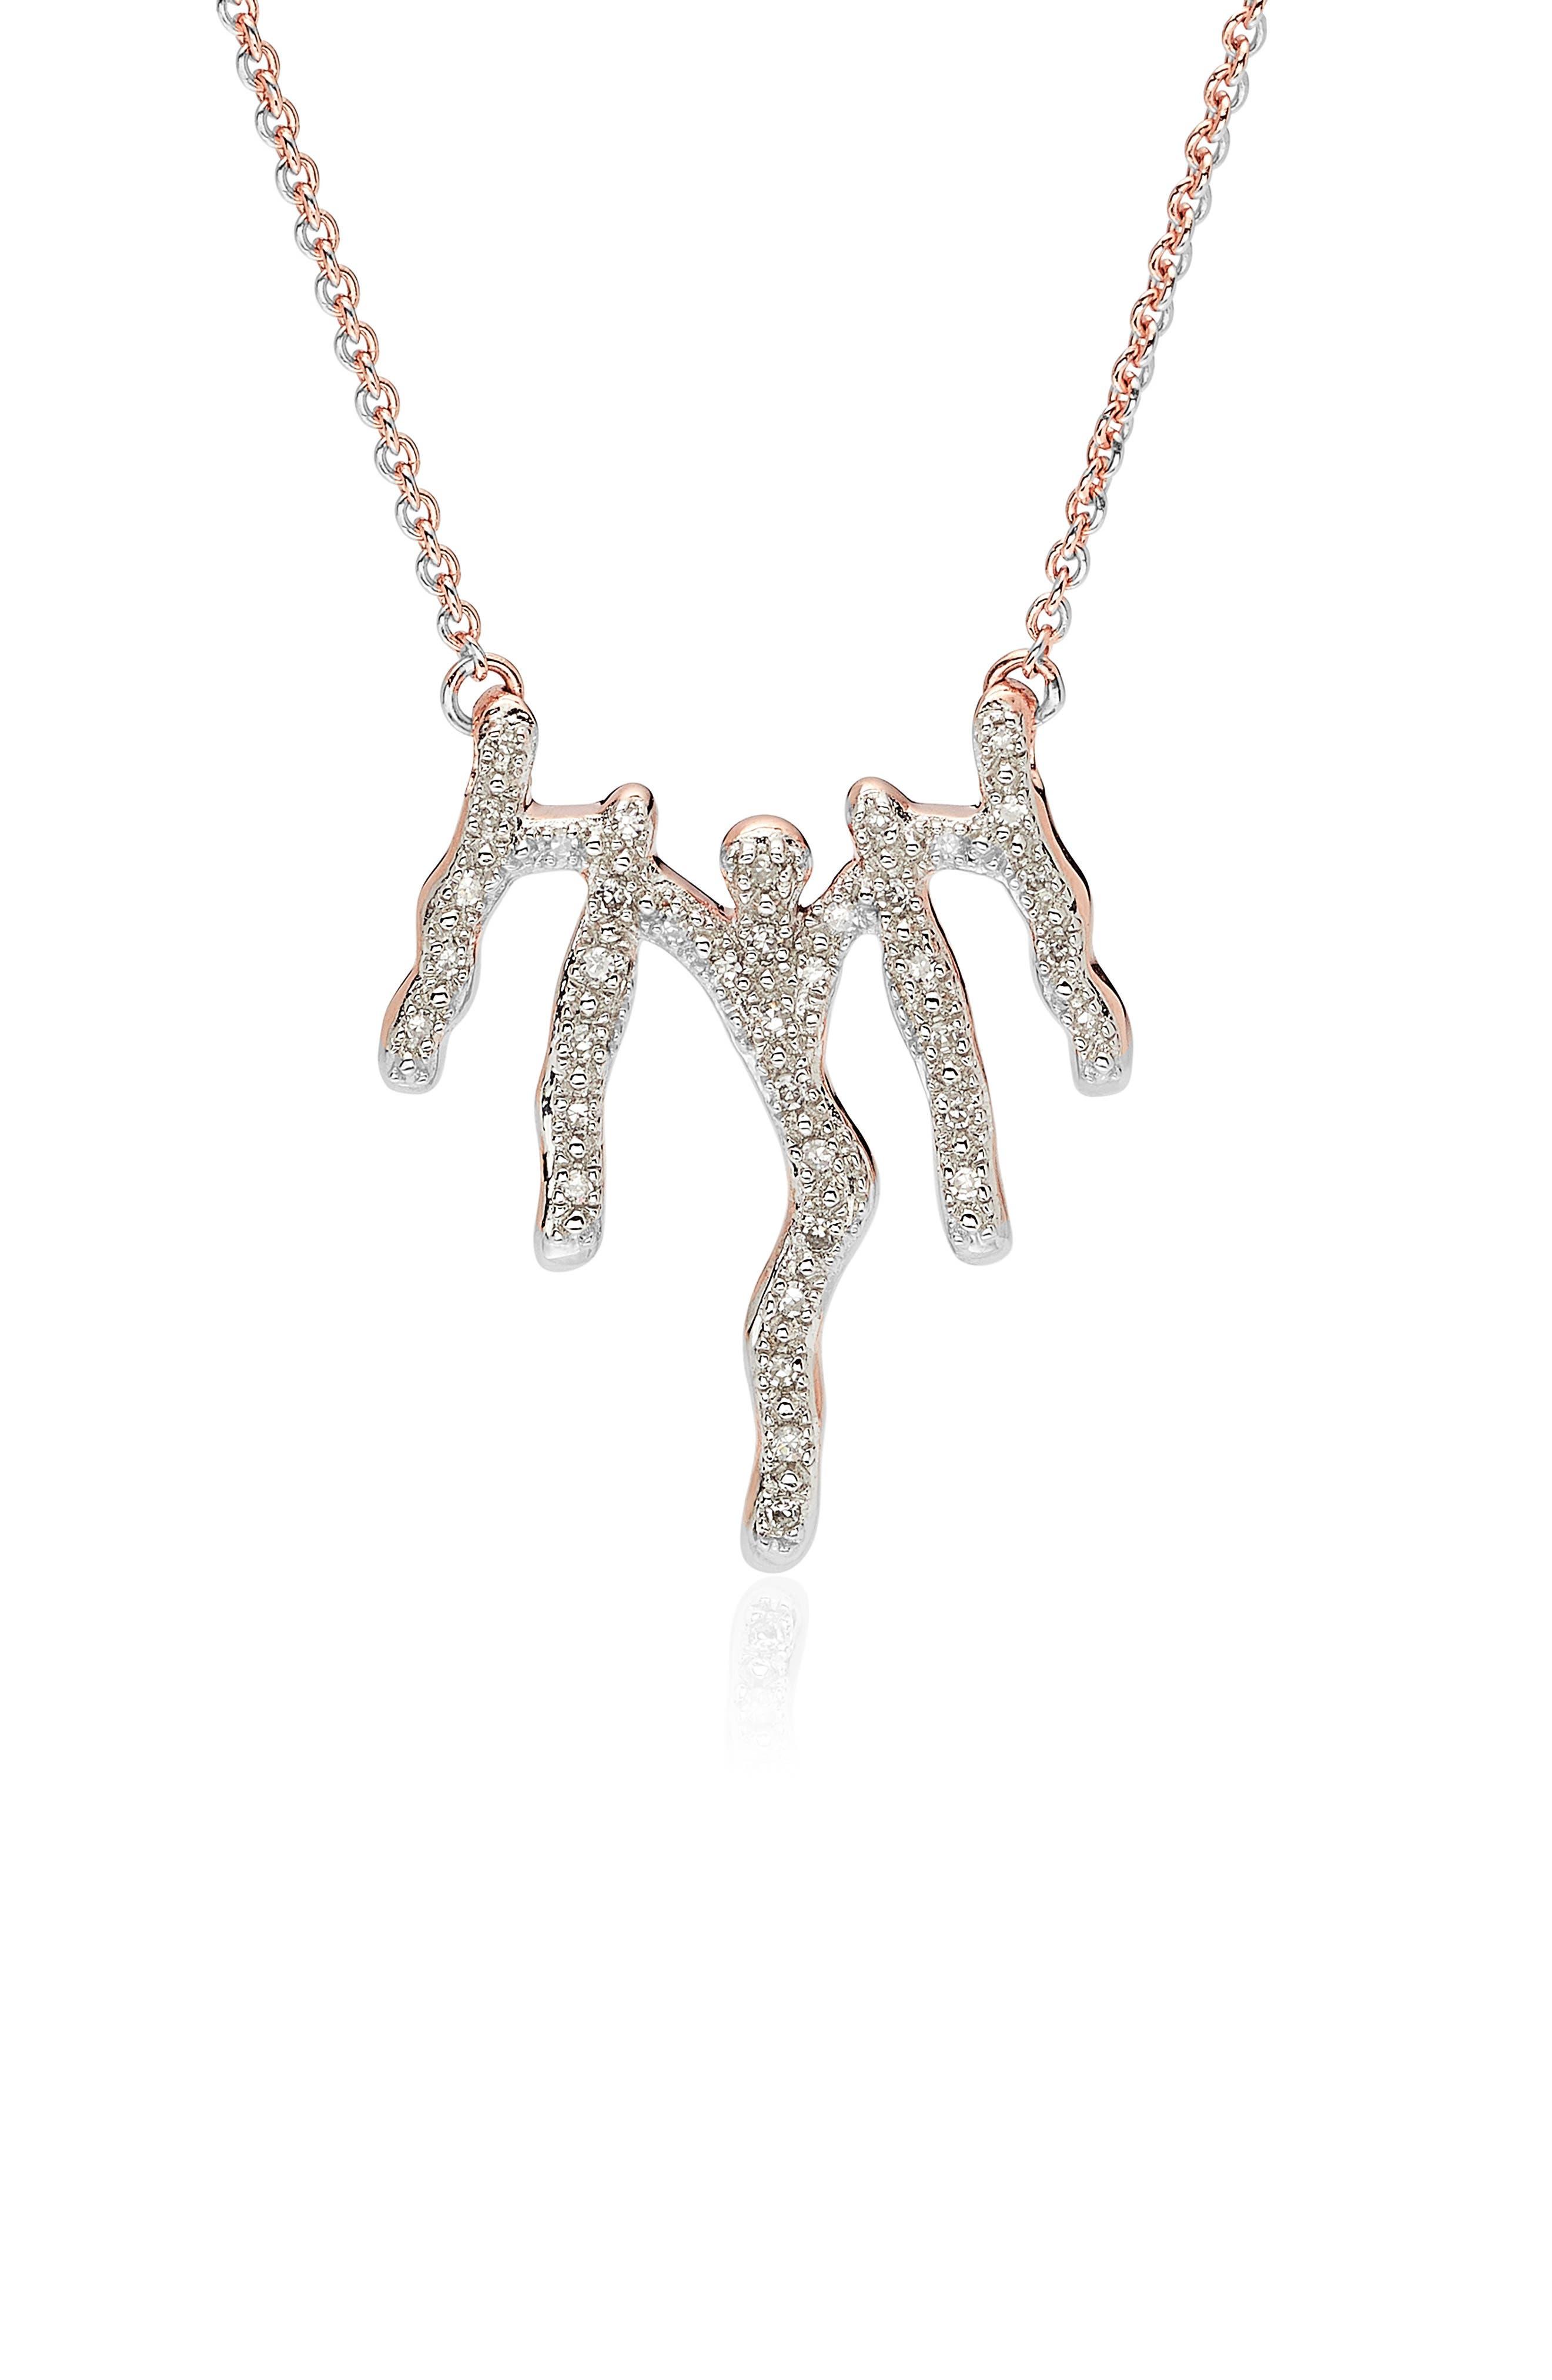 Riva Waterfall Diamond Necklace,                             Main thumbnail 1, color,                             ROSE GOLD/ DIAMOND